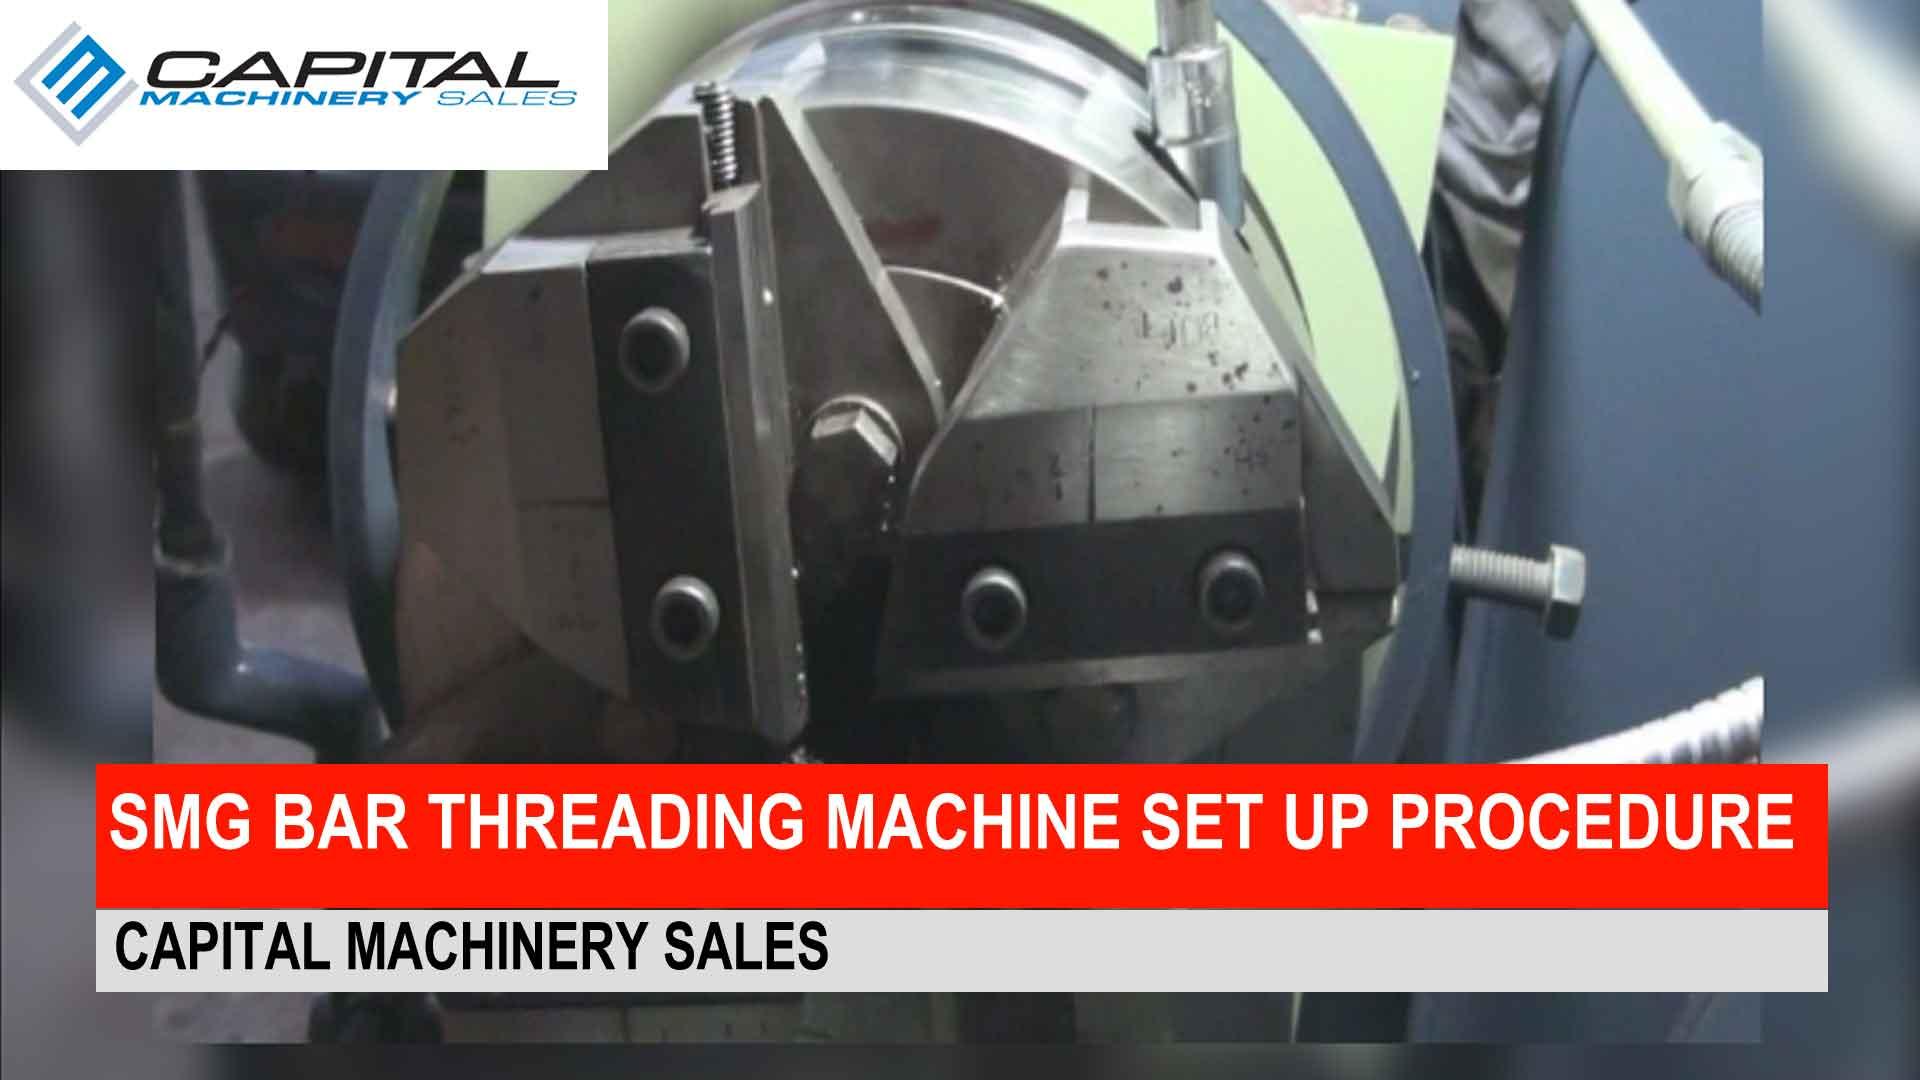 SMG Bar Threading Machine set up procedure